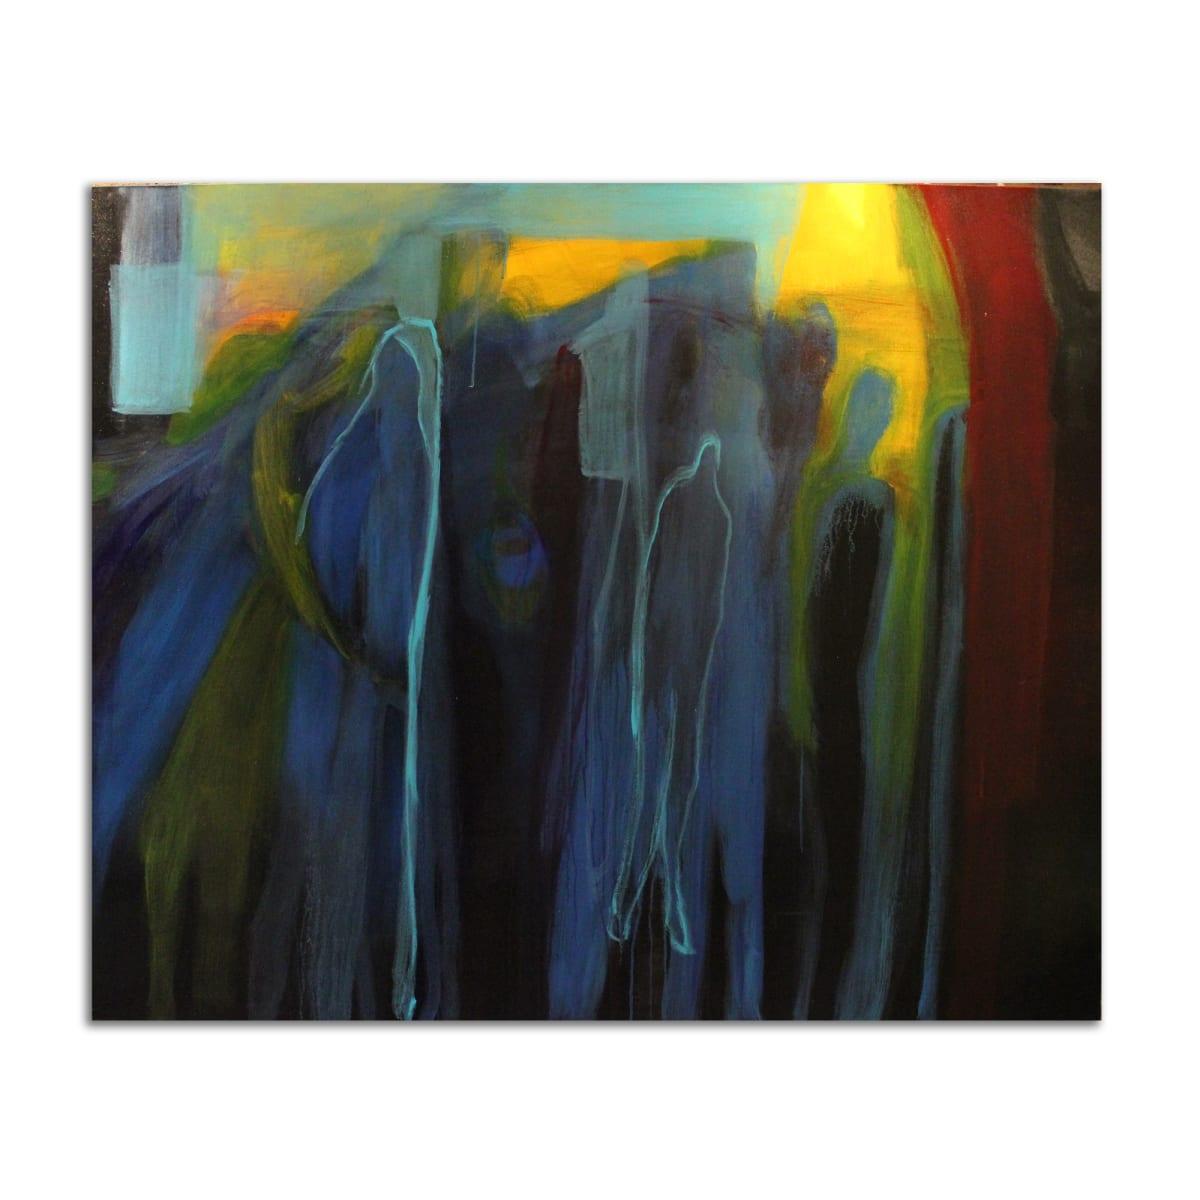 Night Dream by Stephanie Cramer